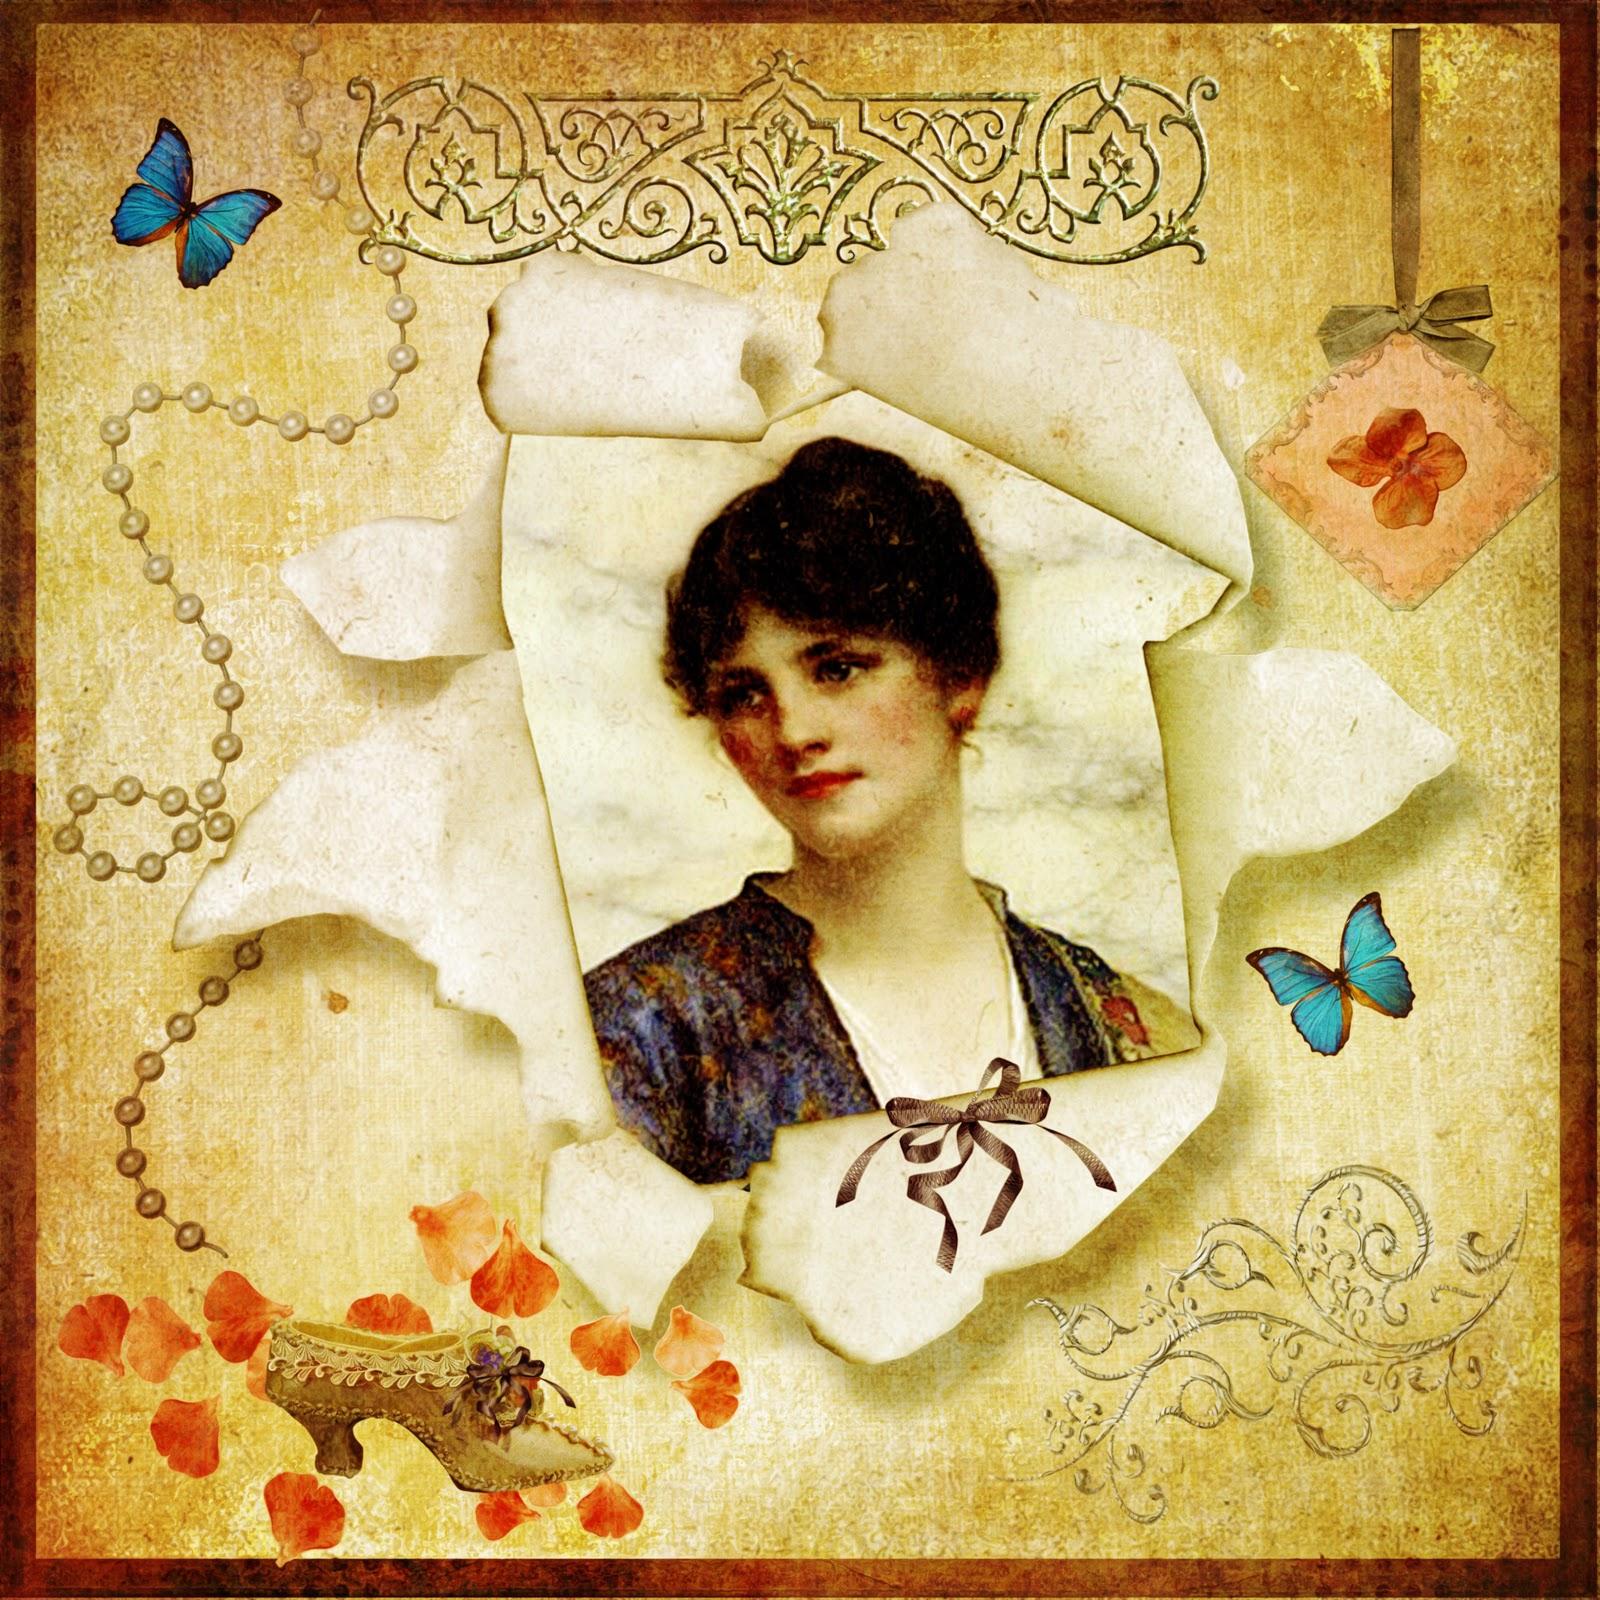 http://1.bp.blogspot.com/_alKRzD6N38s/TLFwqPaIkGI/AAAAAAAACjk/BNNb0ukZUJA/s1600/torn+paper.jpg